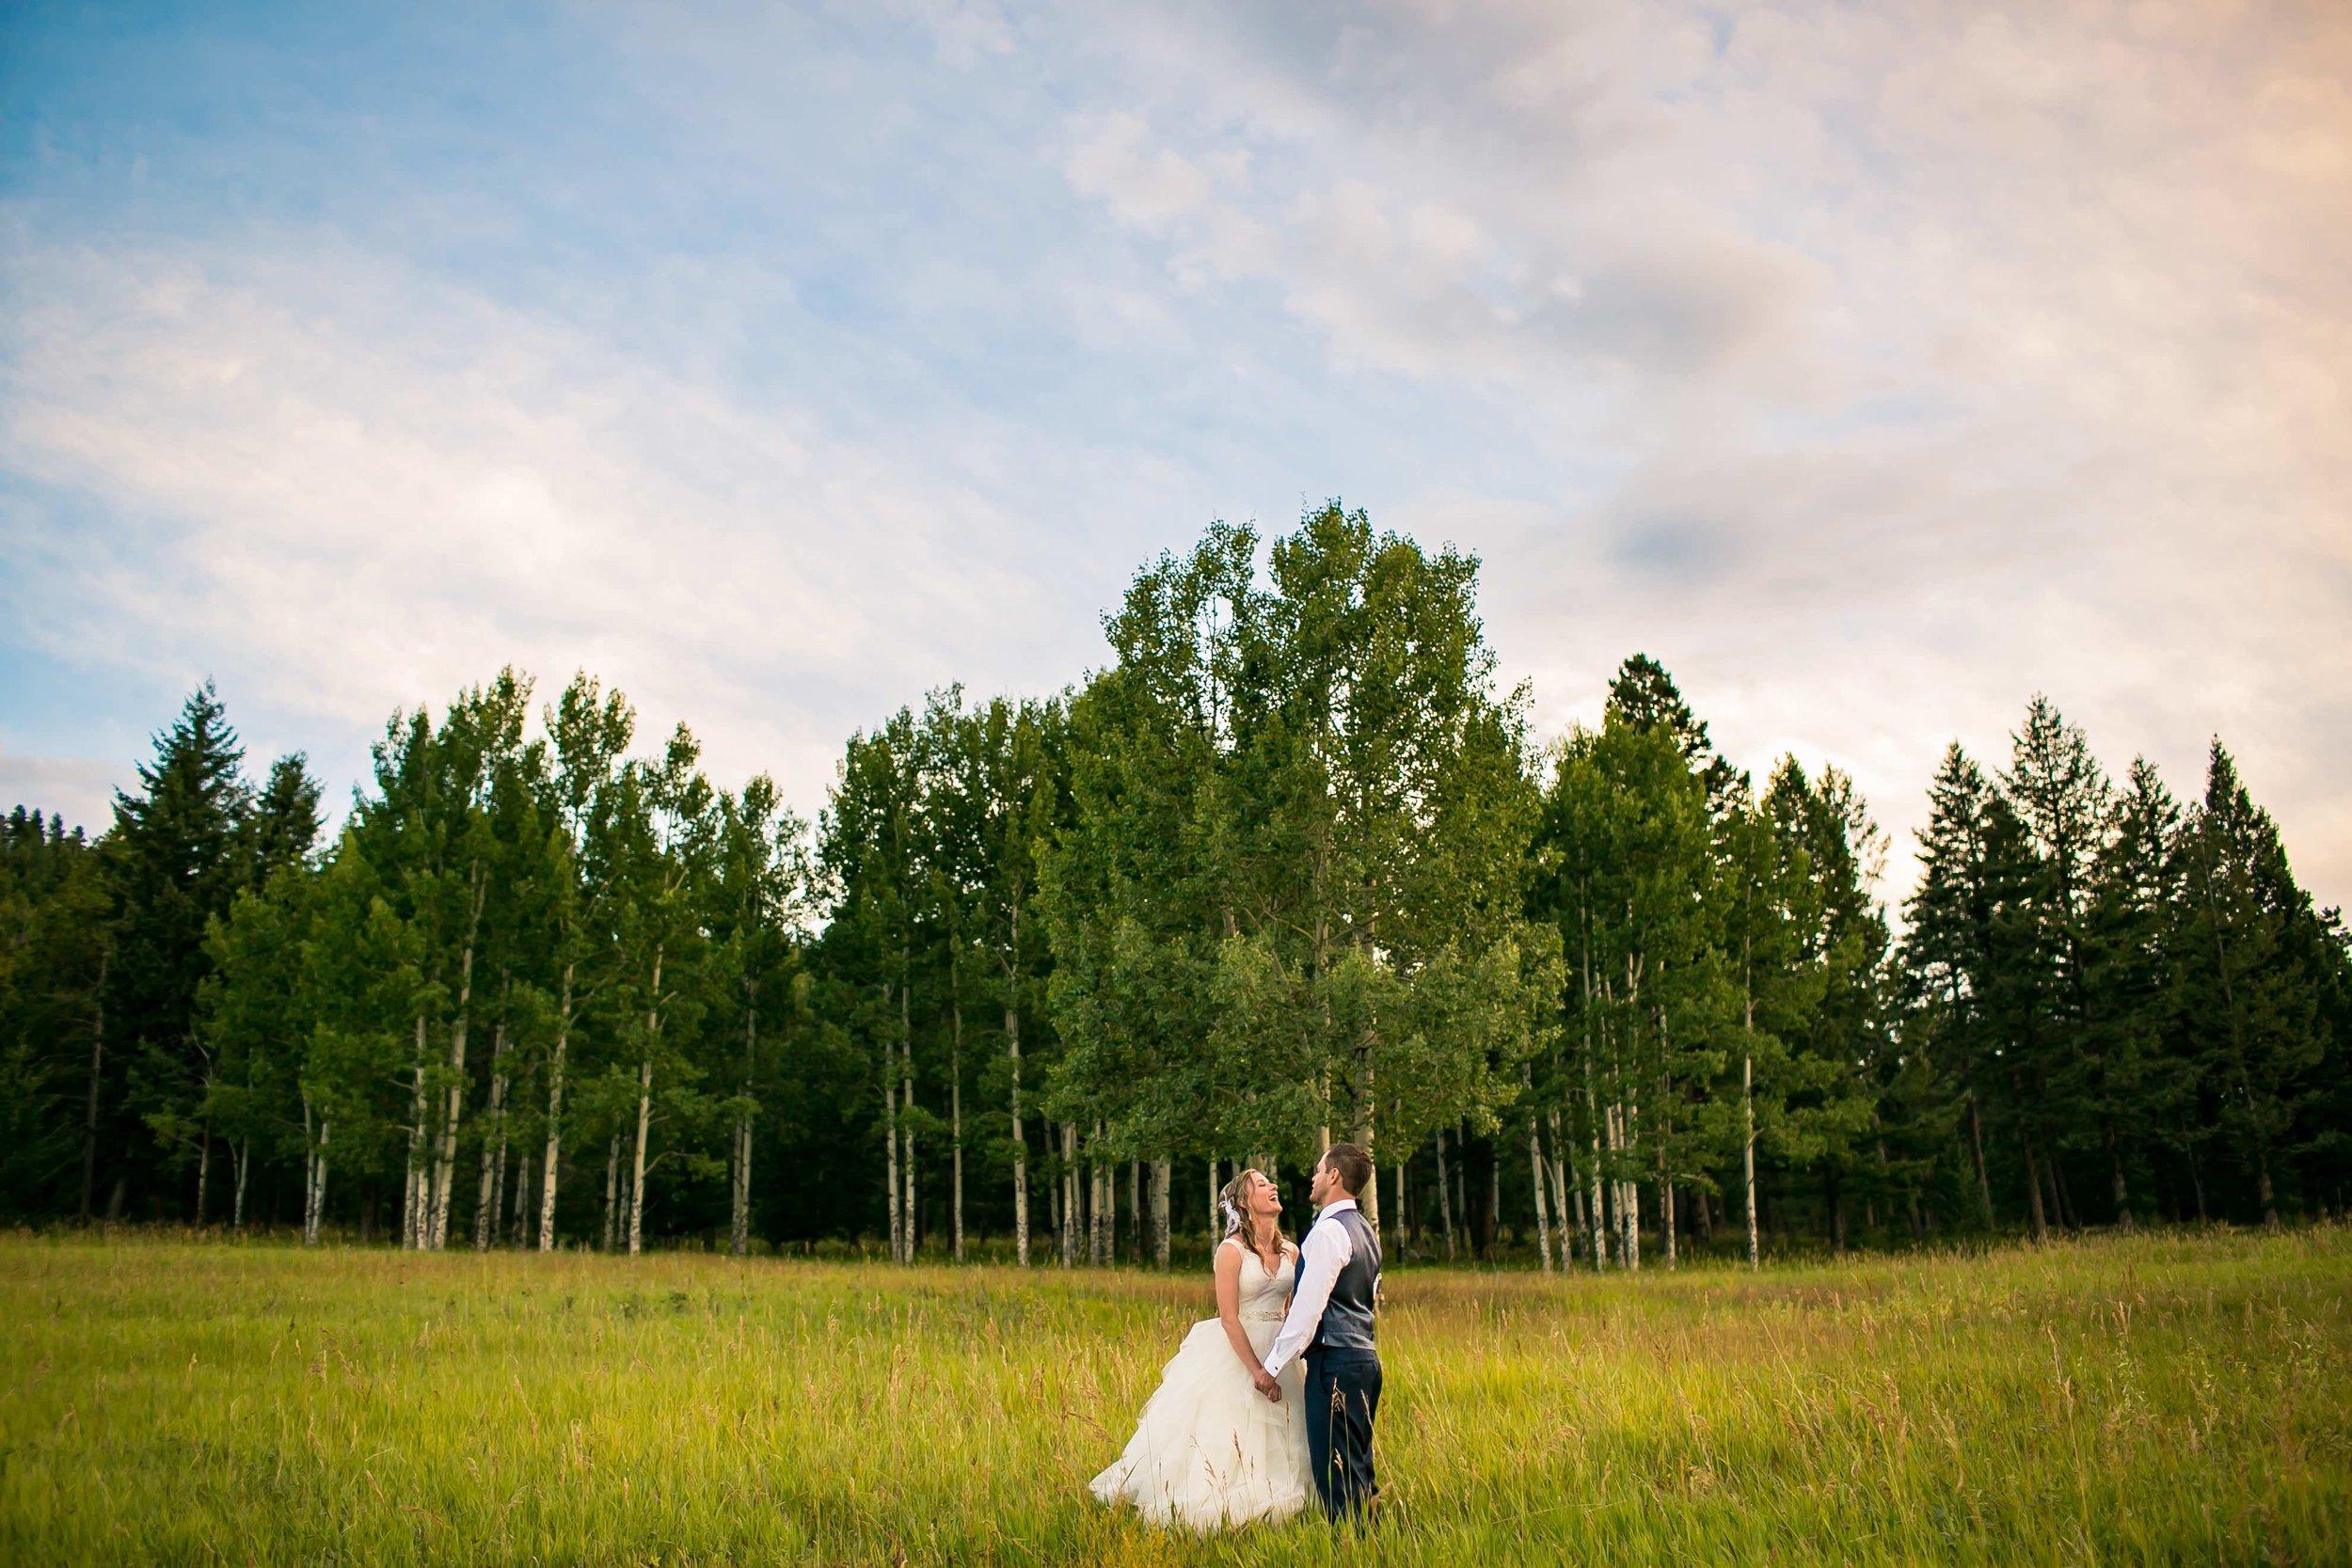 -colorado-wedding-photographer-denver-springs-vail-meadows-at-marshdale-